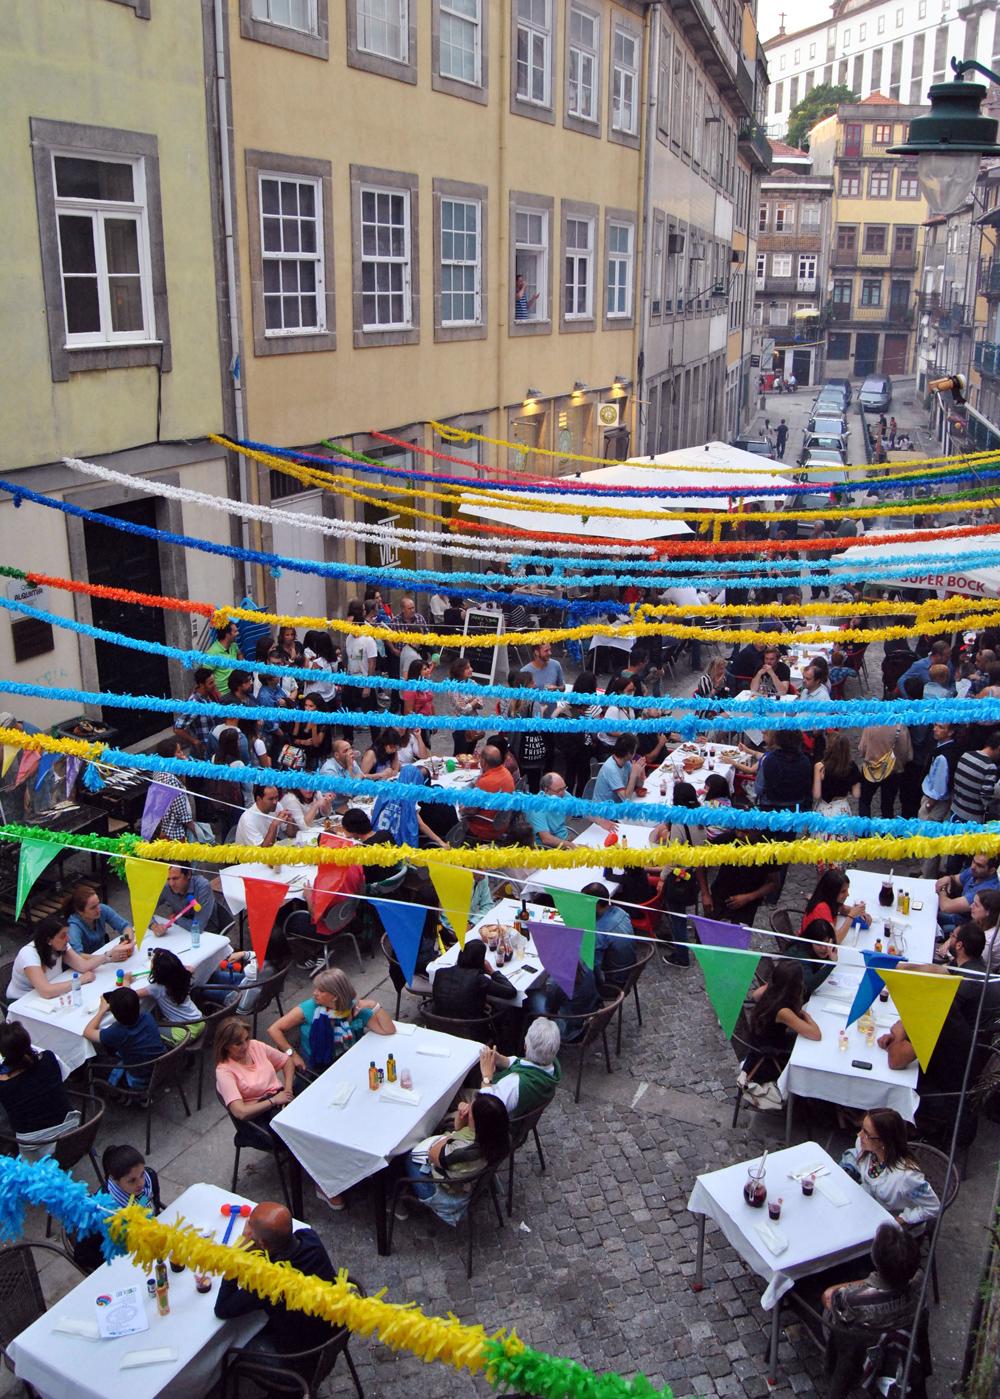 Porto_festa_de_sao_joao3_Parasta_matkalla_blogi